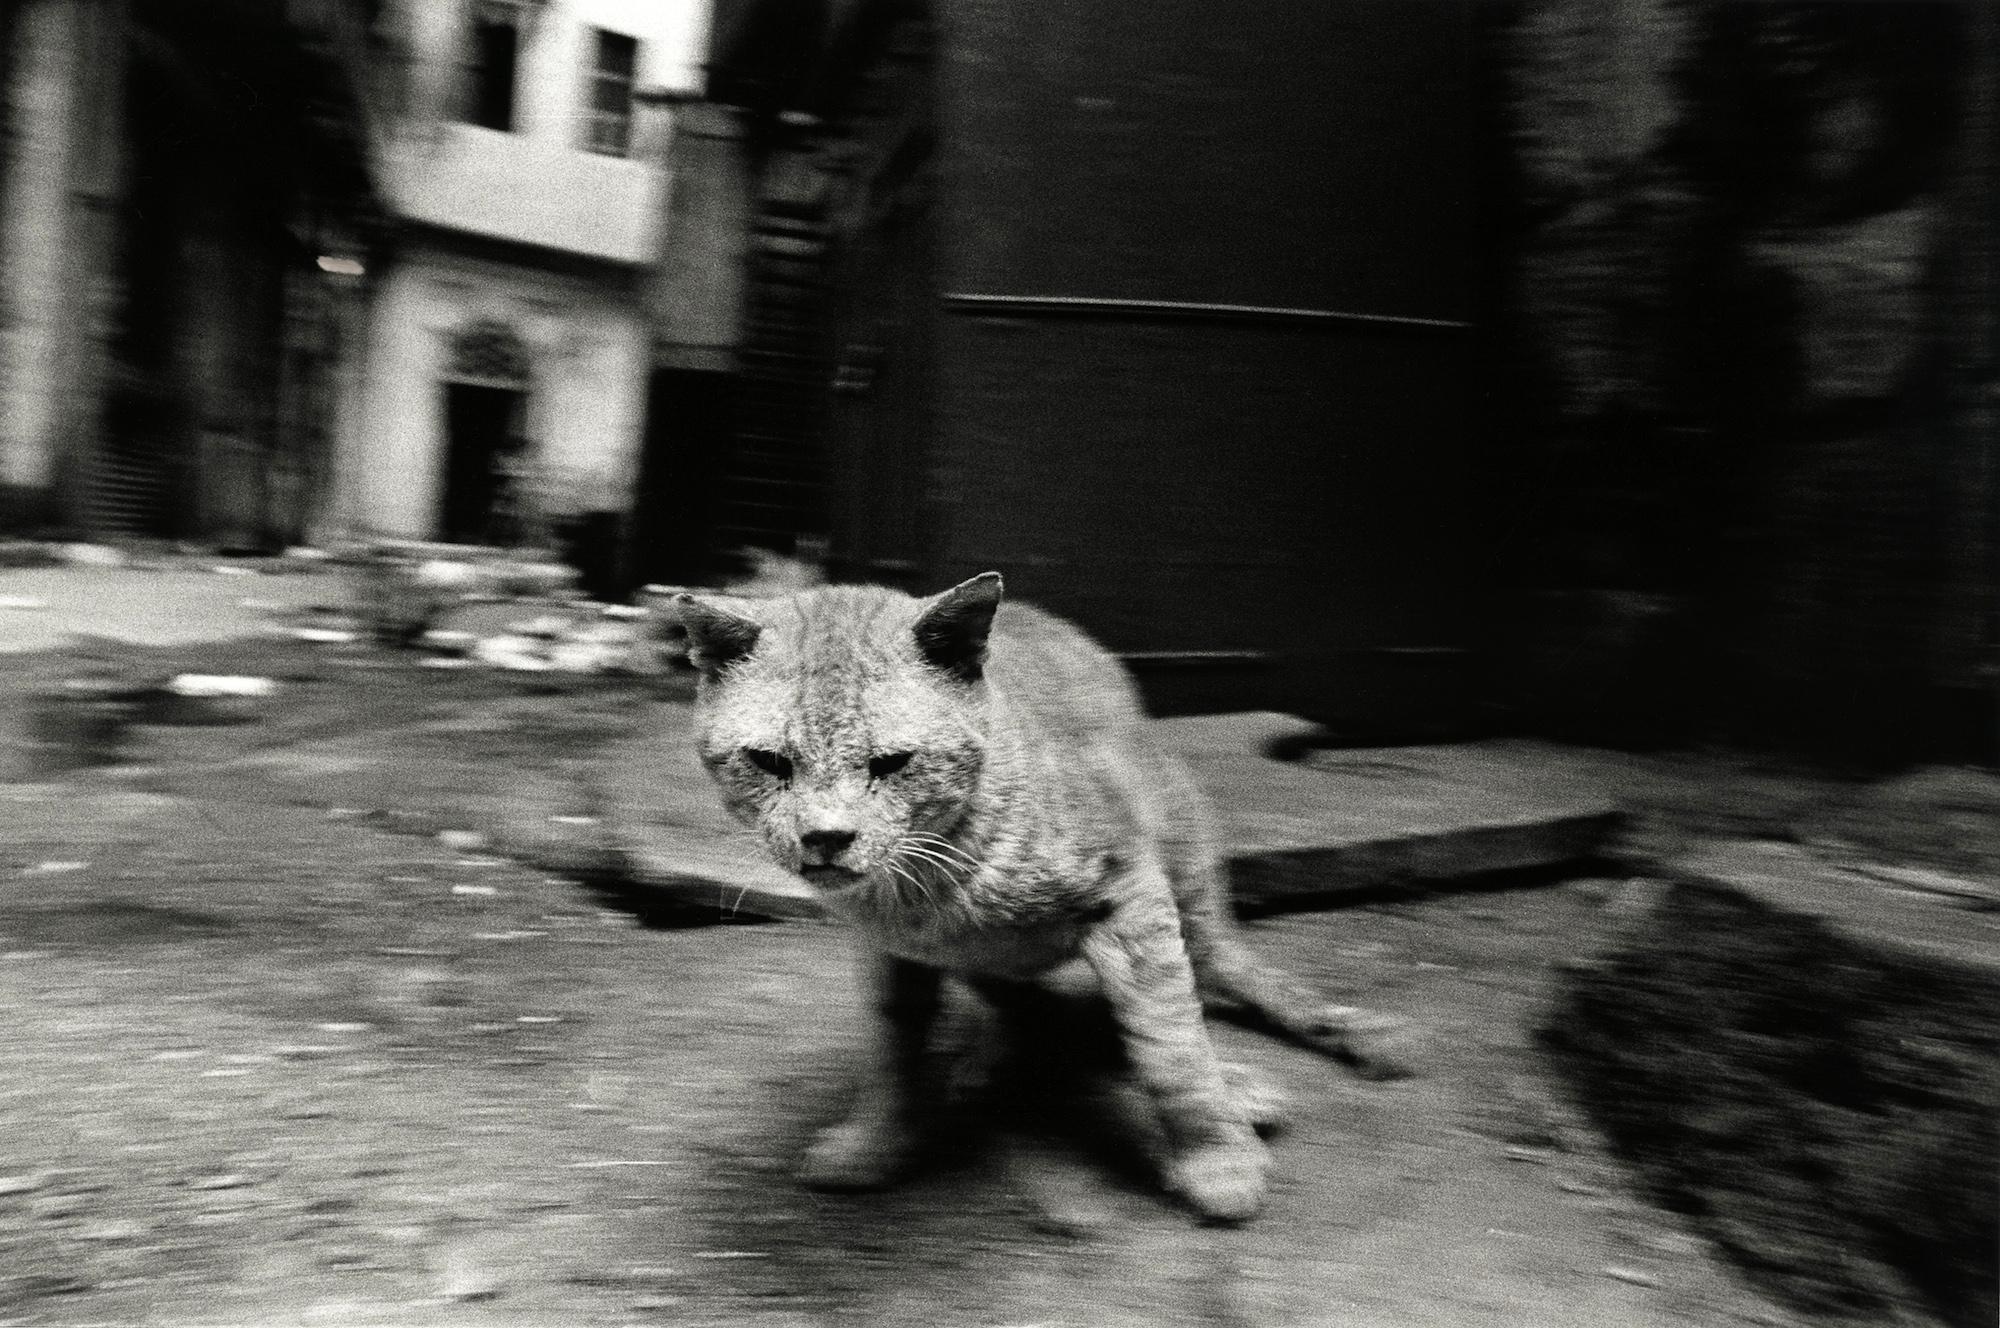 walter_rothwell_photography_cats-04.jpg